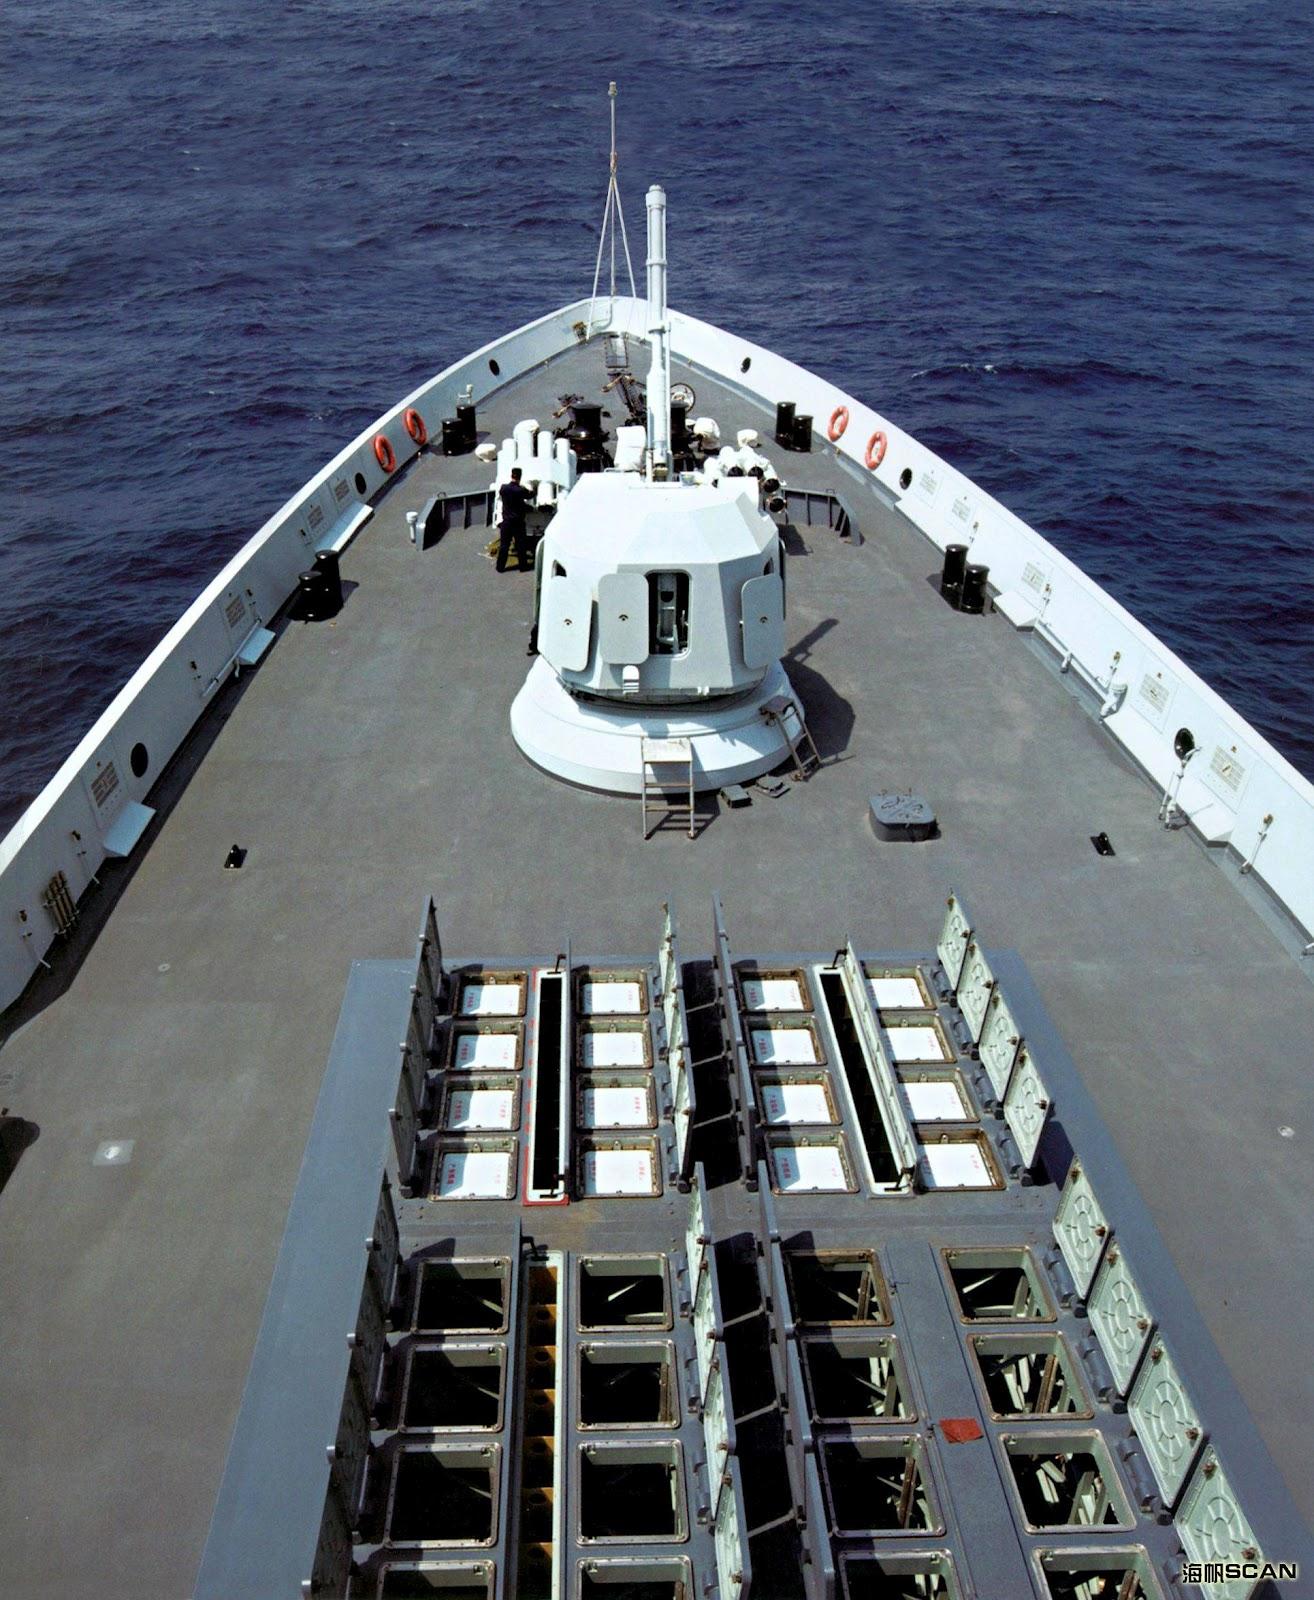 التنين الصيني وسهامه المميته ( حصري وشامل ) Type+054A+Jiangkai+II)+frigate+Chinese+People's+Liberation+Army+Navy+HQ-16+(Hongqi-16)+naval+9K37M1-2+system+Shtil+(SA-N-12)+missile